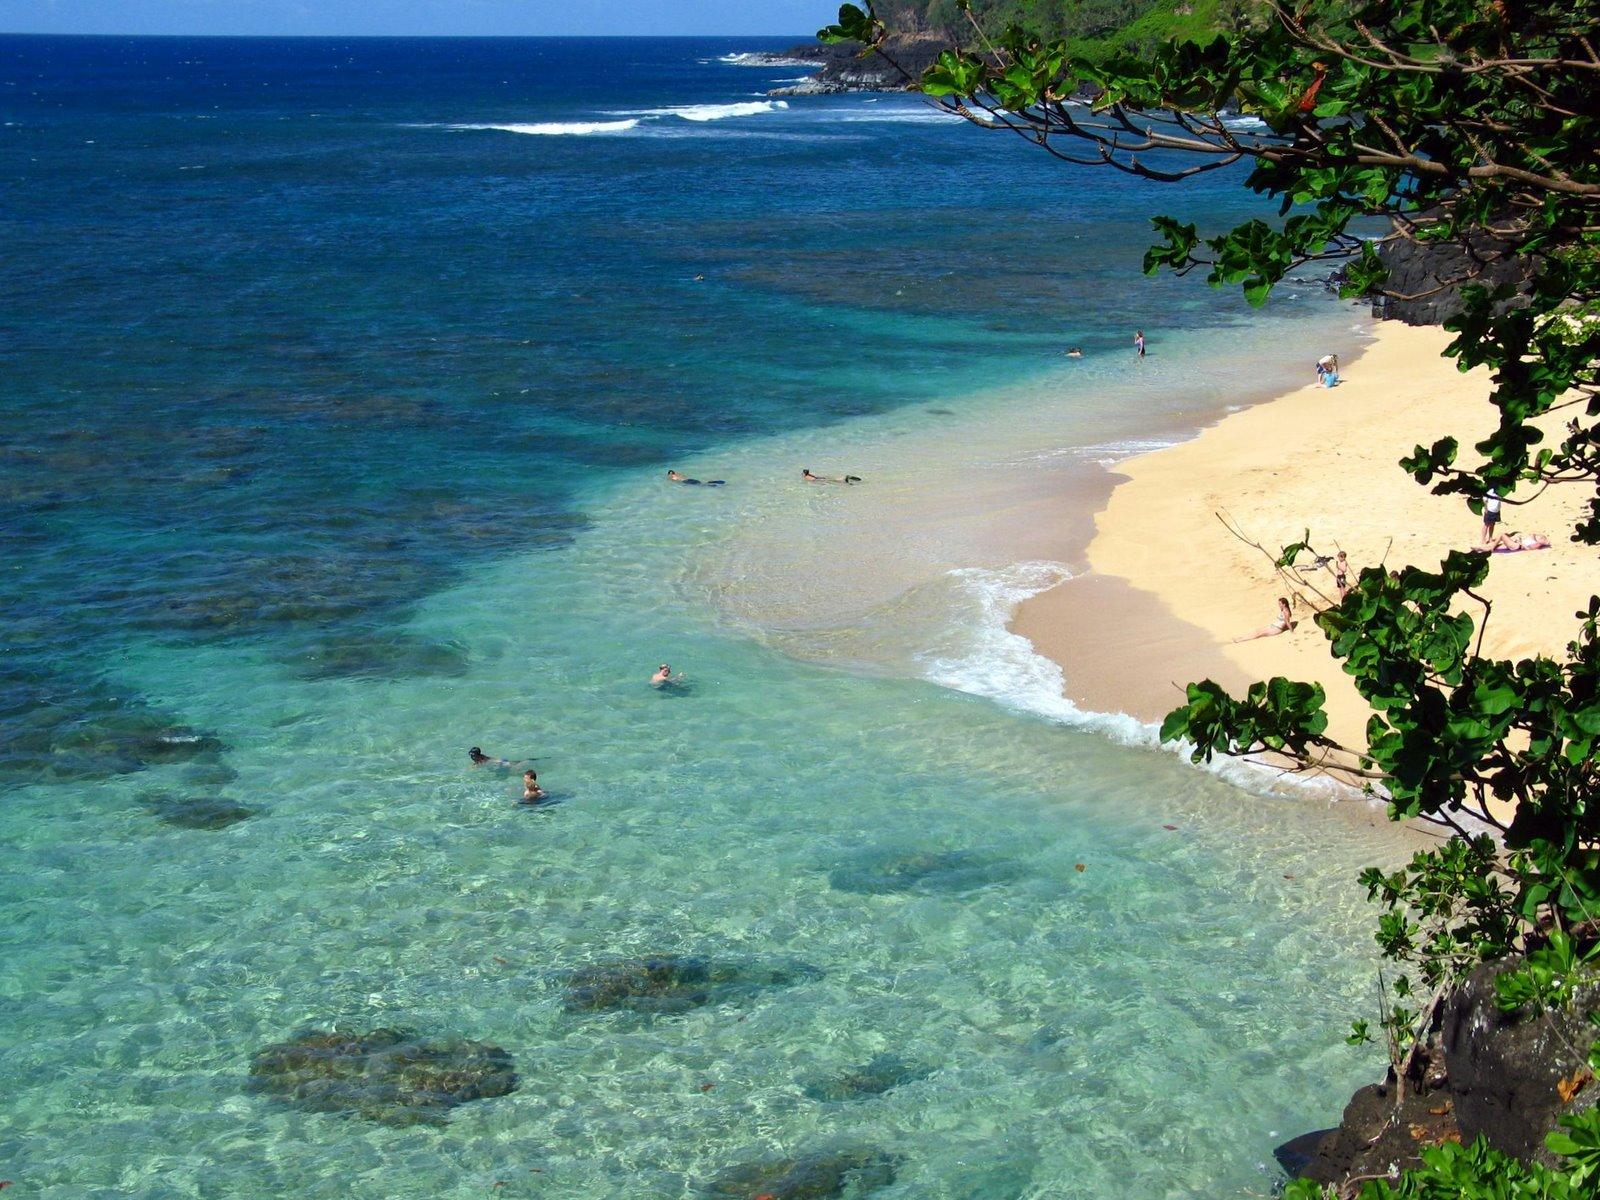 Kauai Hawaii Travel Guide And Travel Info Exotic Travel Destination